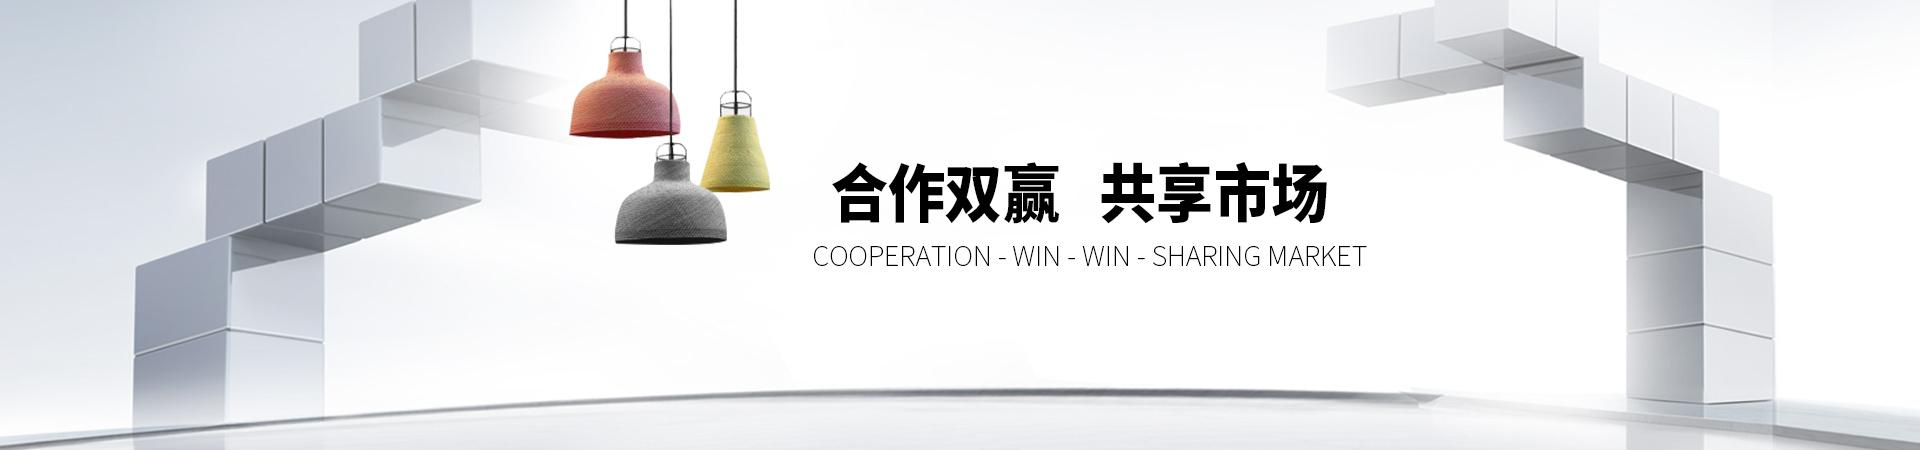 LUCKYSAC合作双赢,共享市场